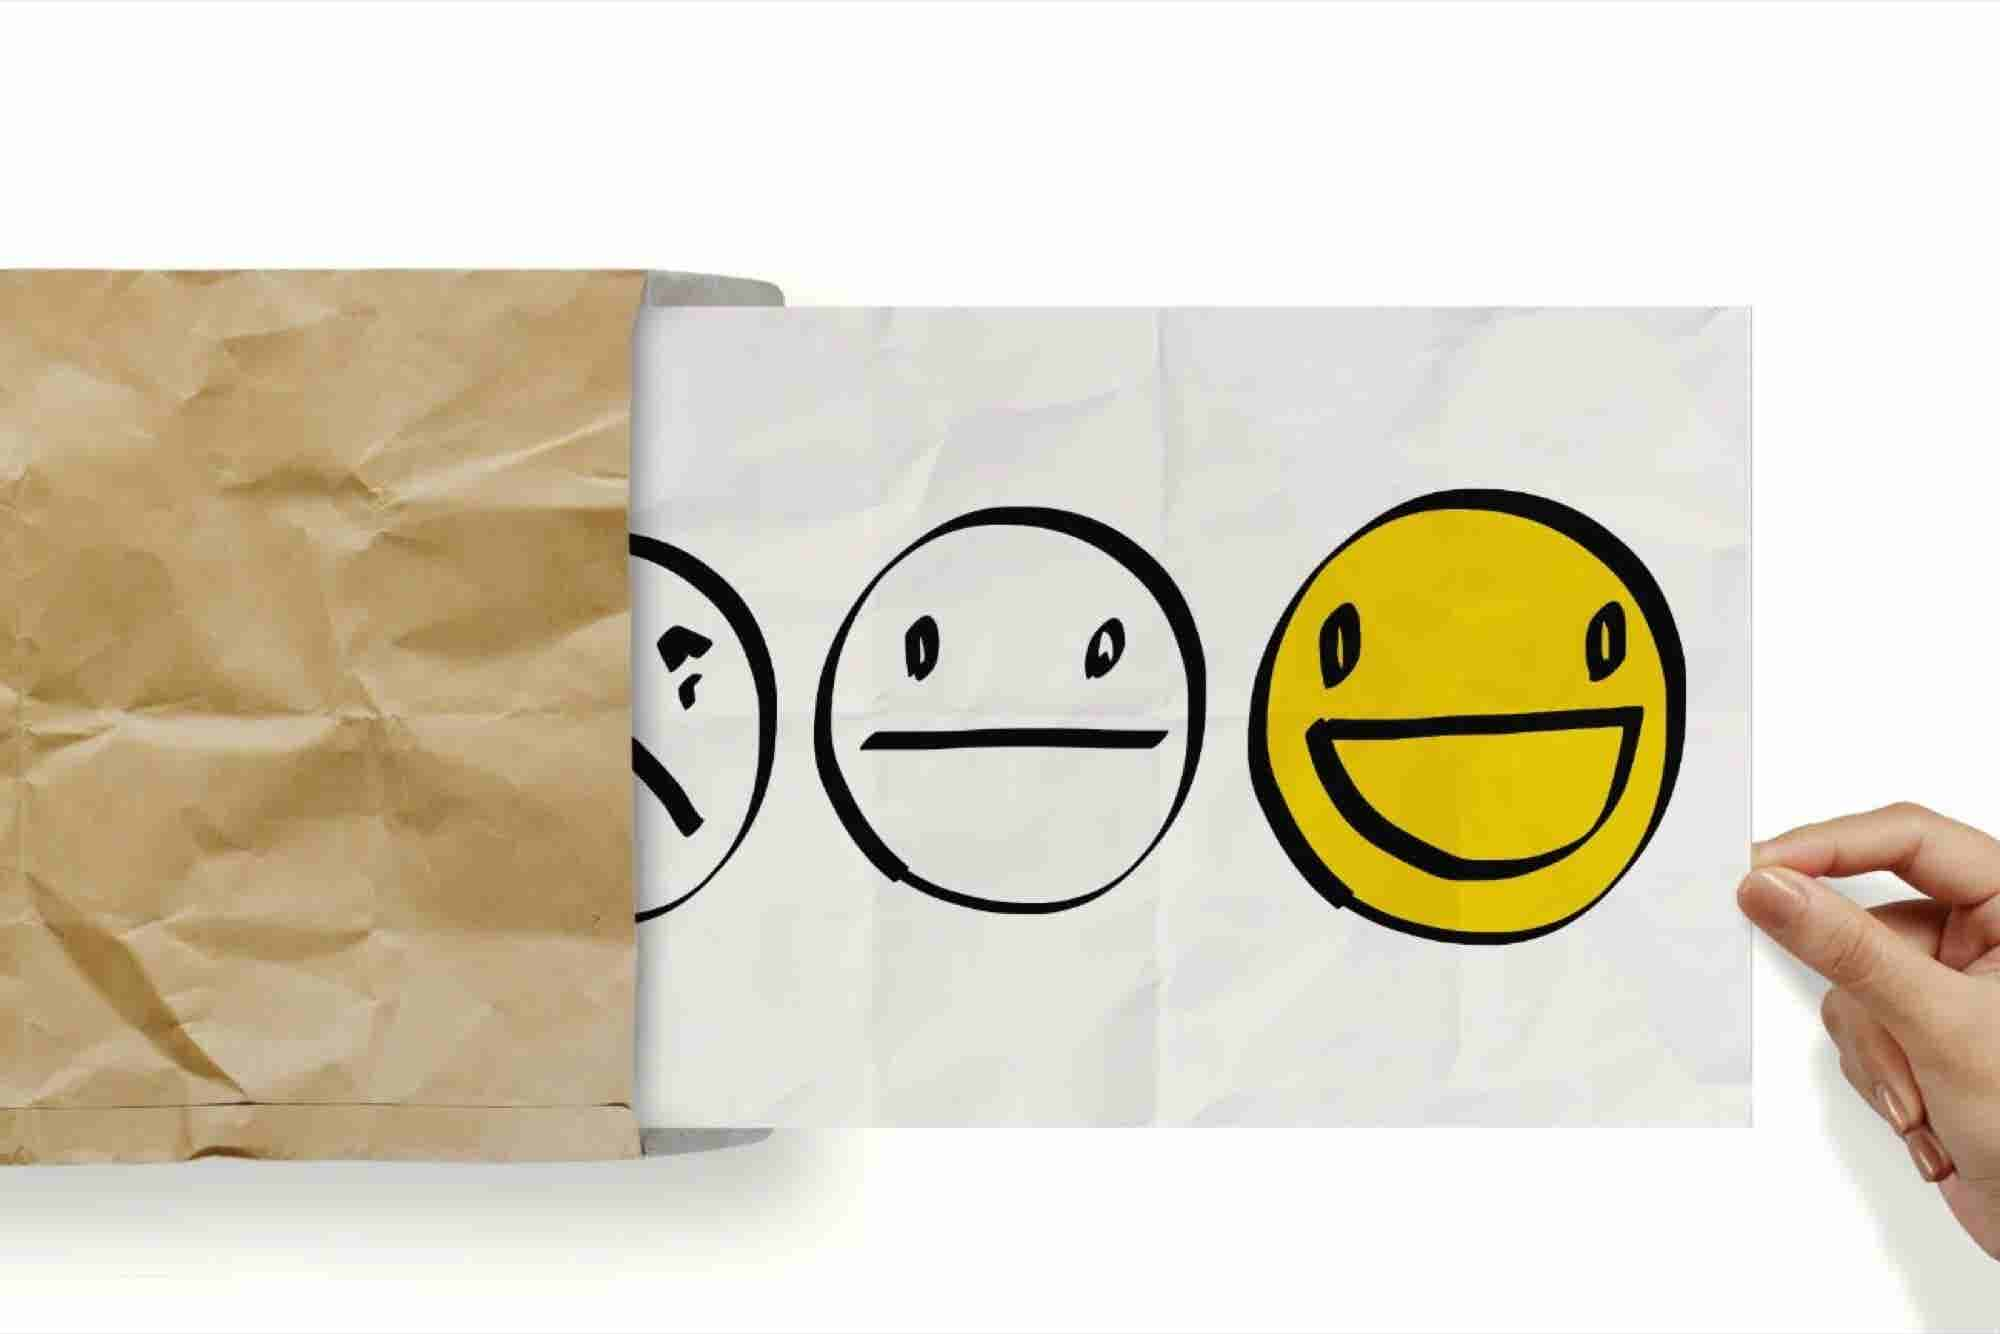 Secretos para hacer feliz a tu mercado